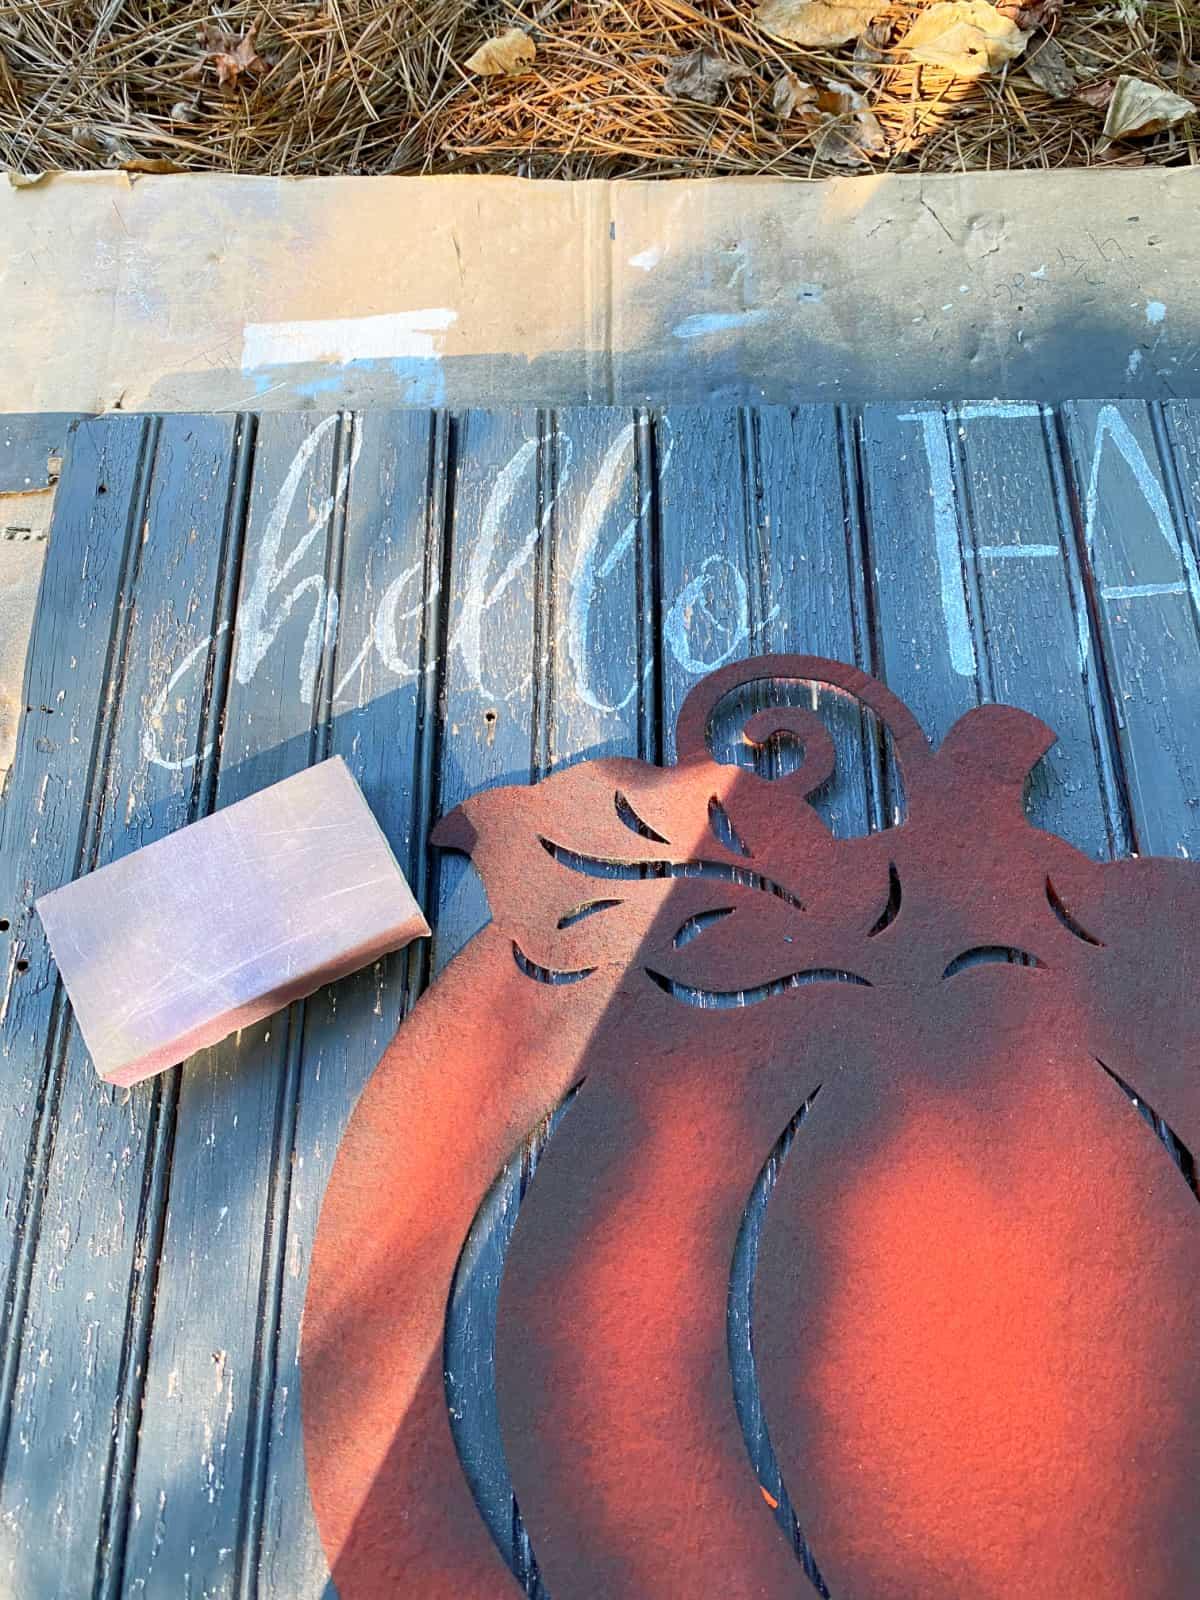 sanding block on fall wood sign